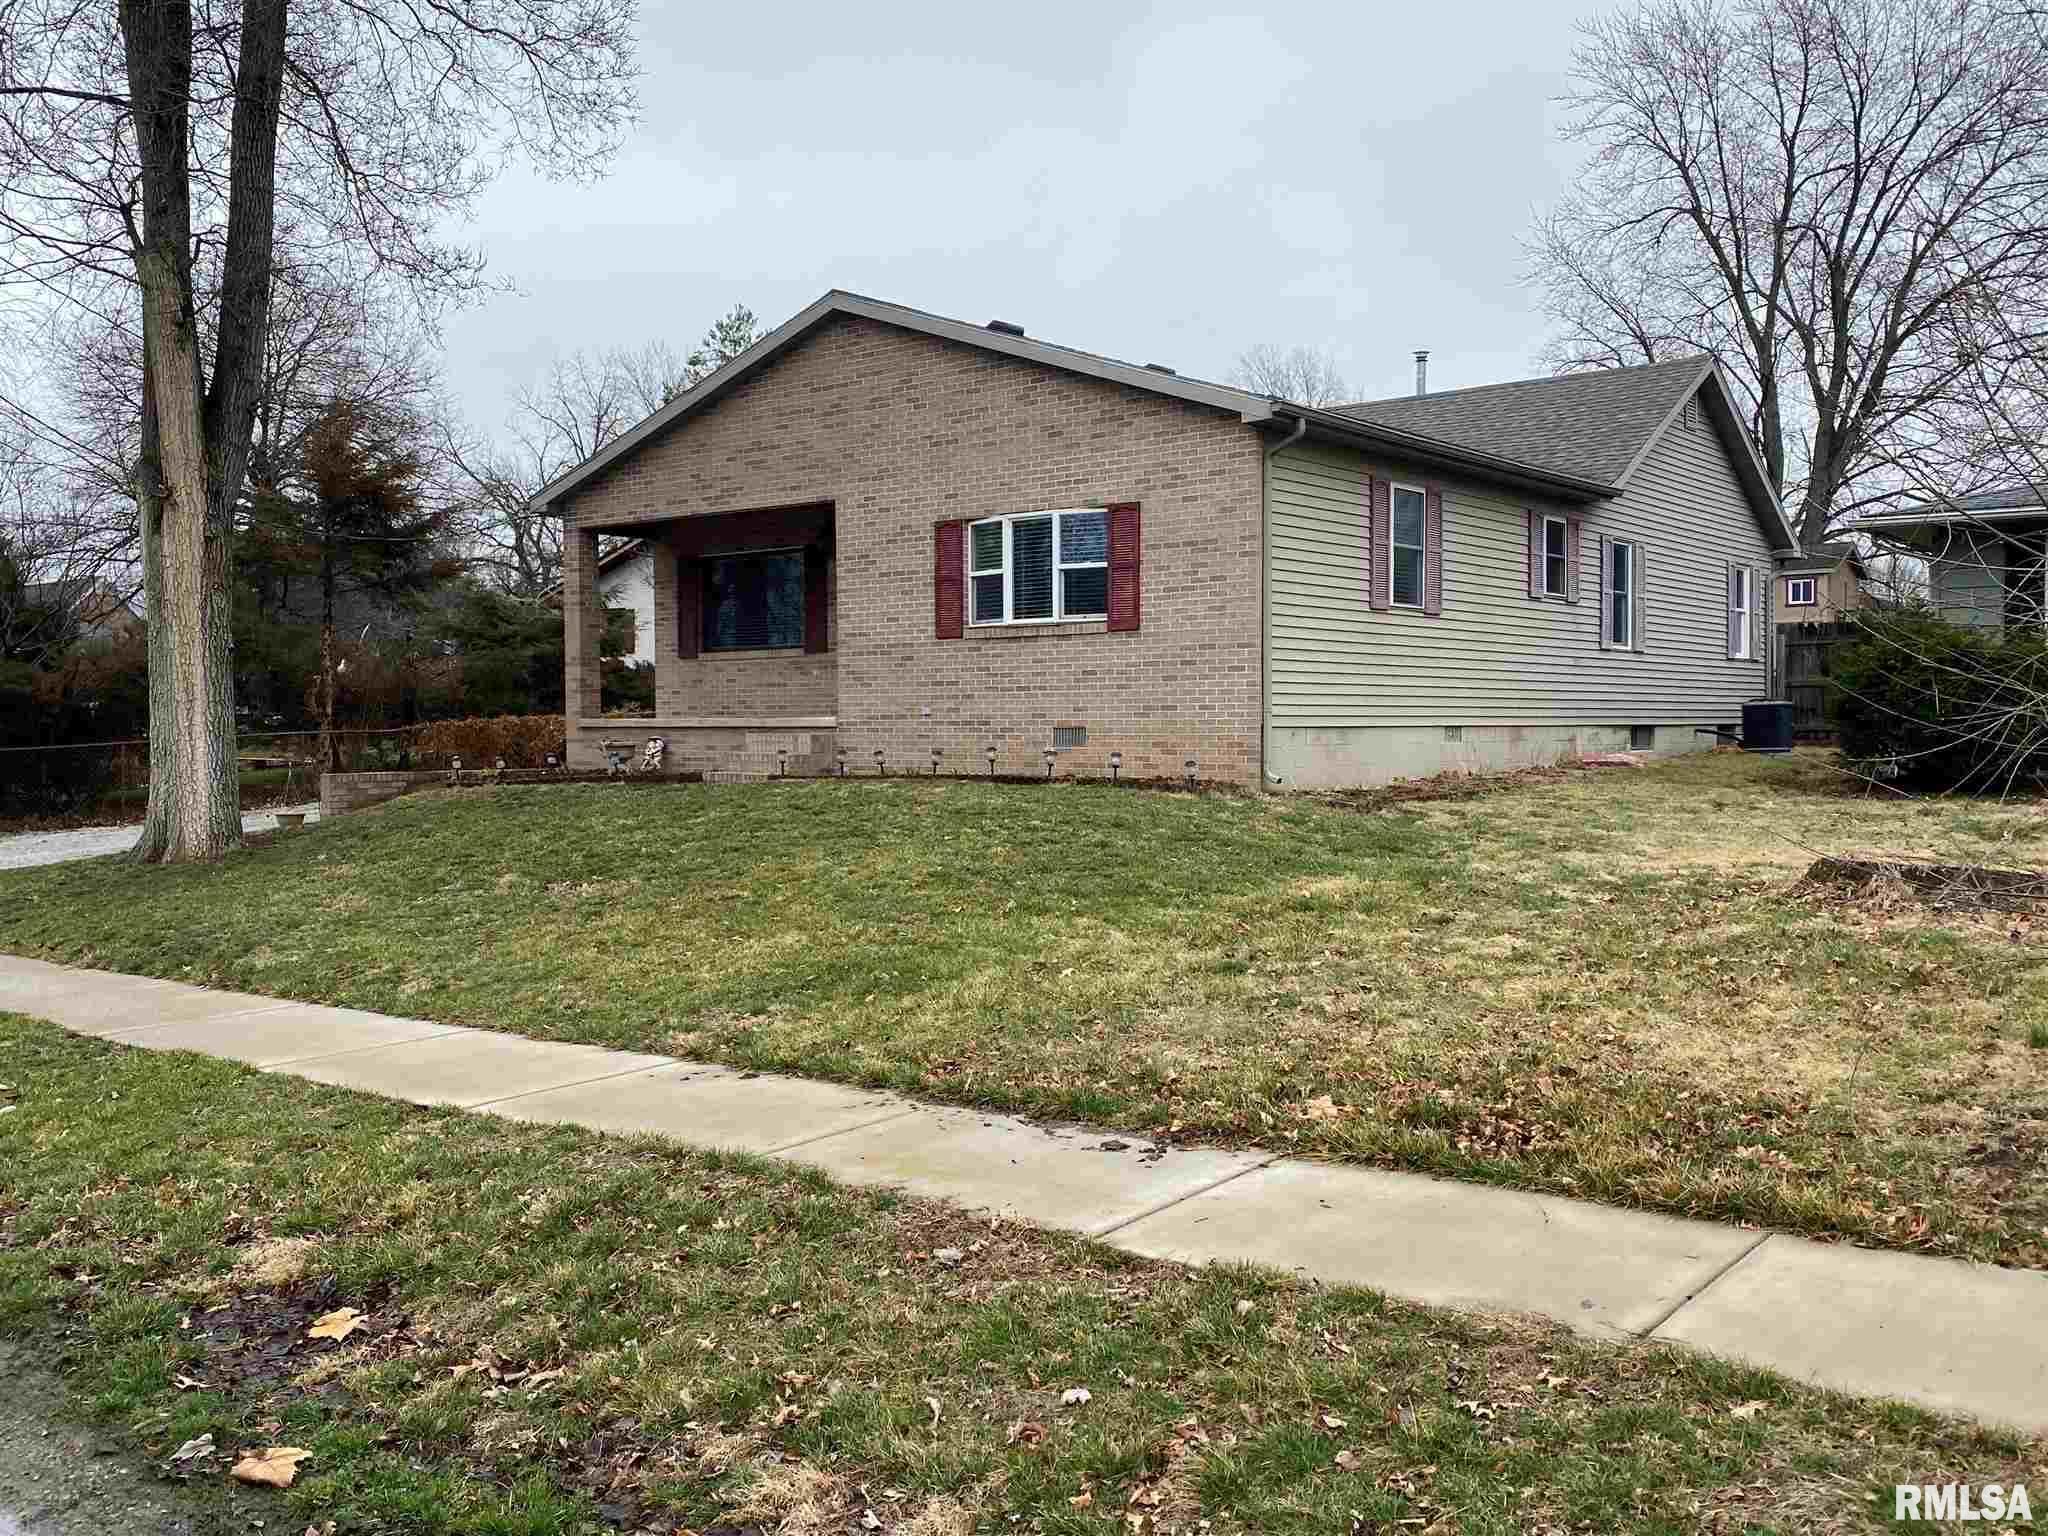 104 S 6TH Property Photo - Riverton, IL real estate listing